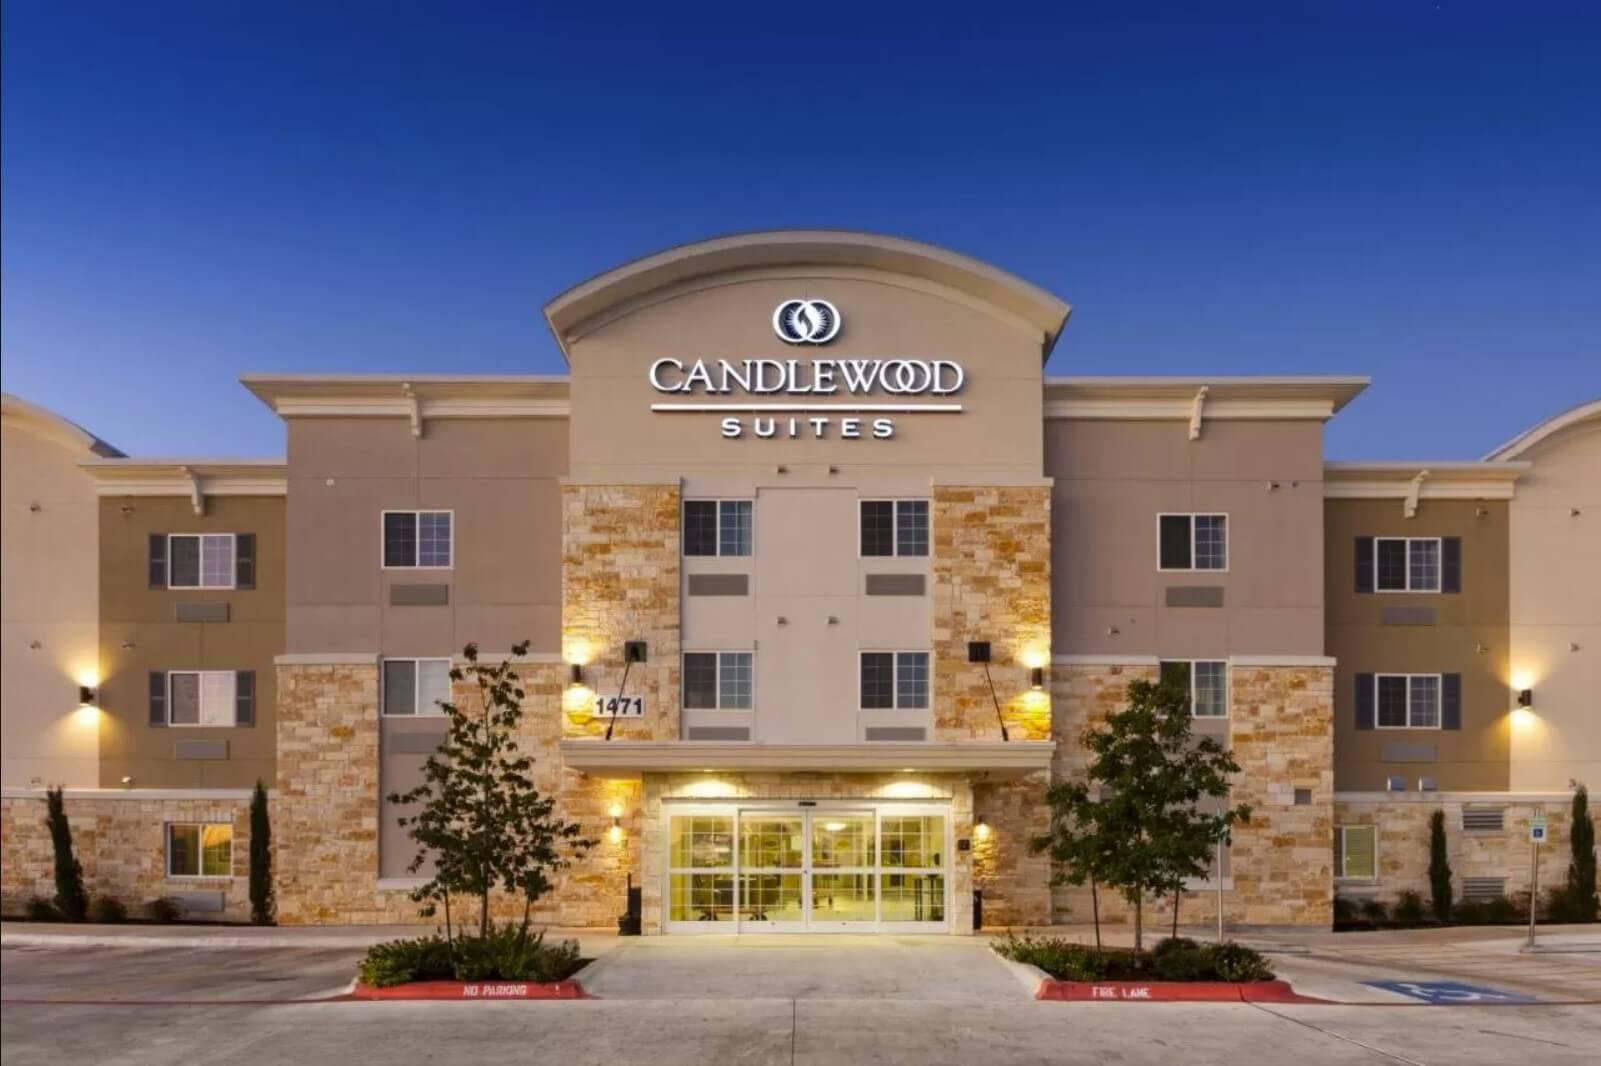 Candlewood Inn & Suites - best midrange economy hotel chain